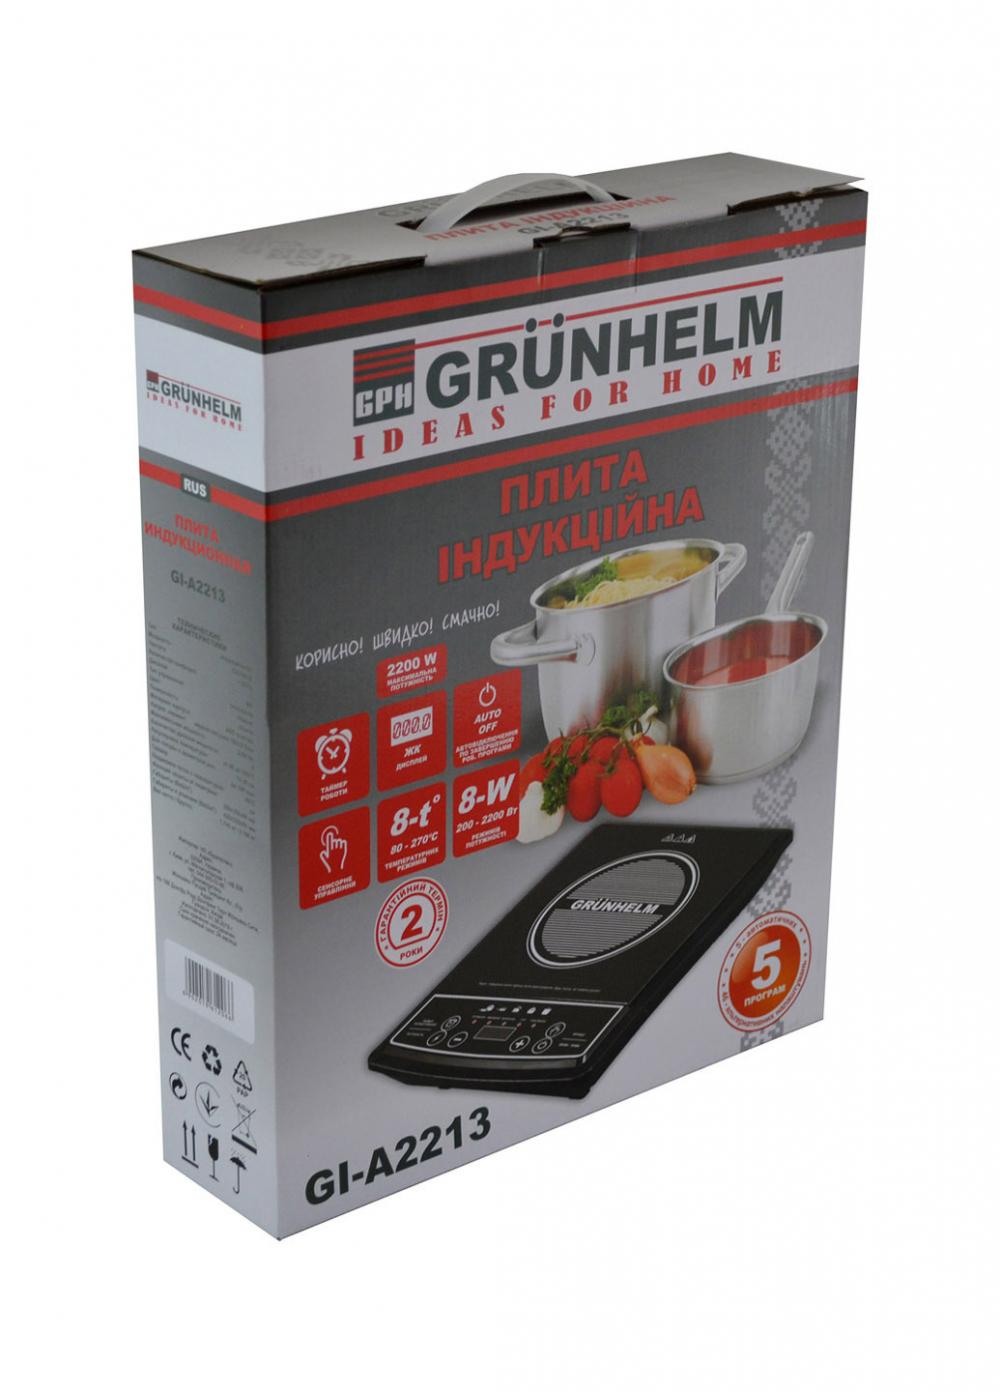 Індукційна плита Grunhelm GI-A2213 - фото 5.